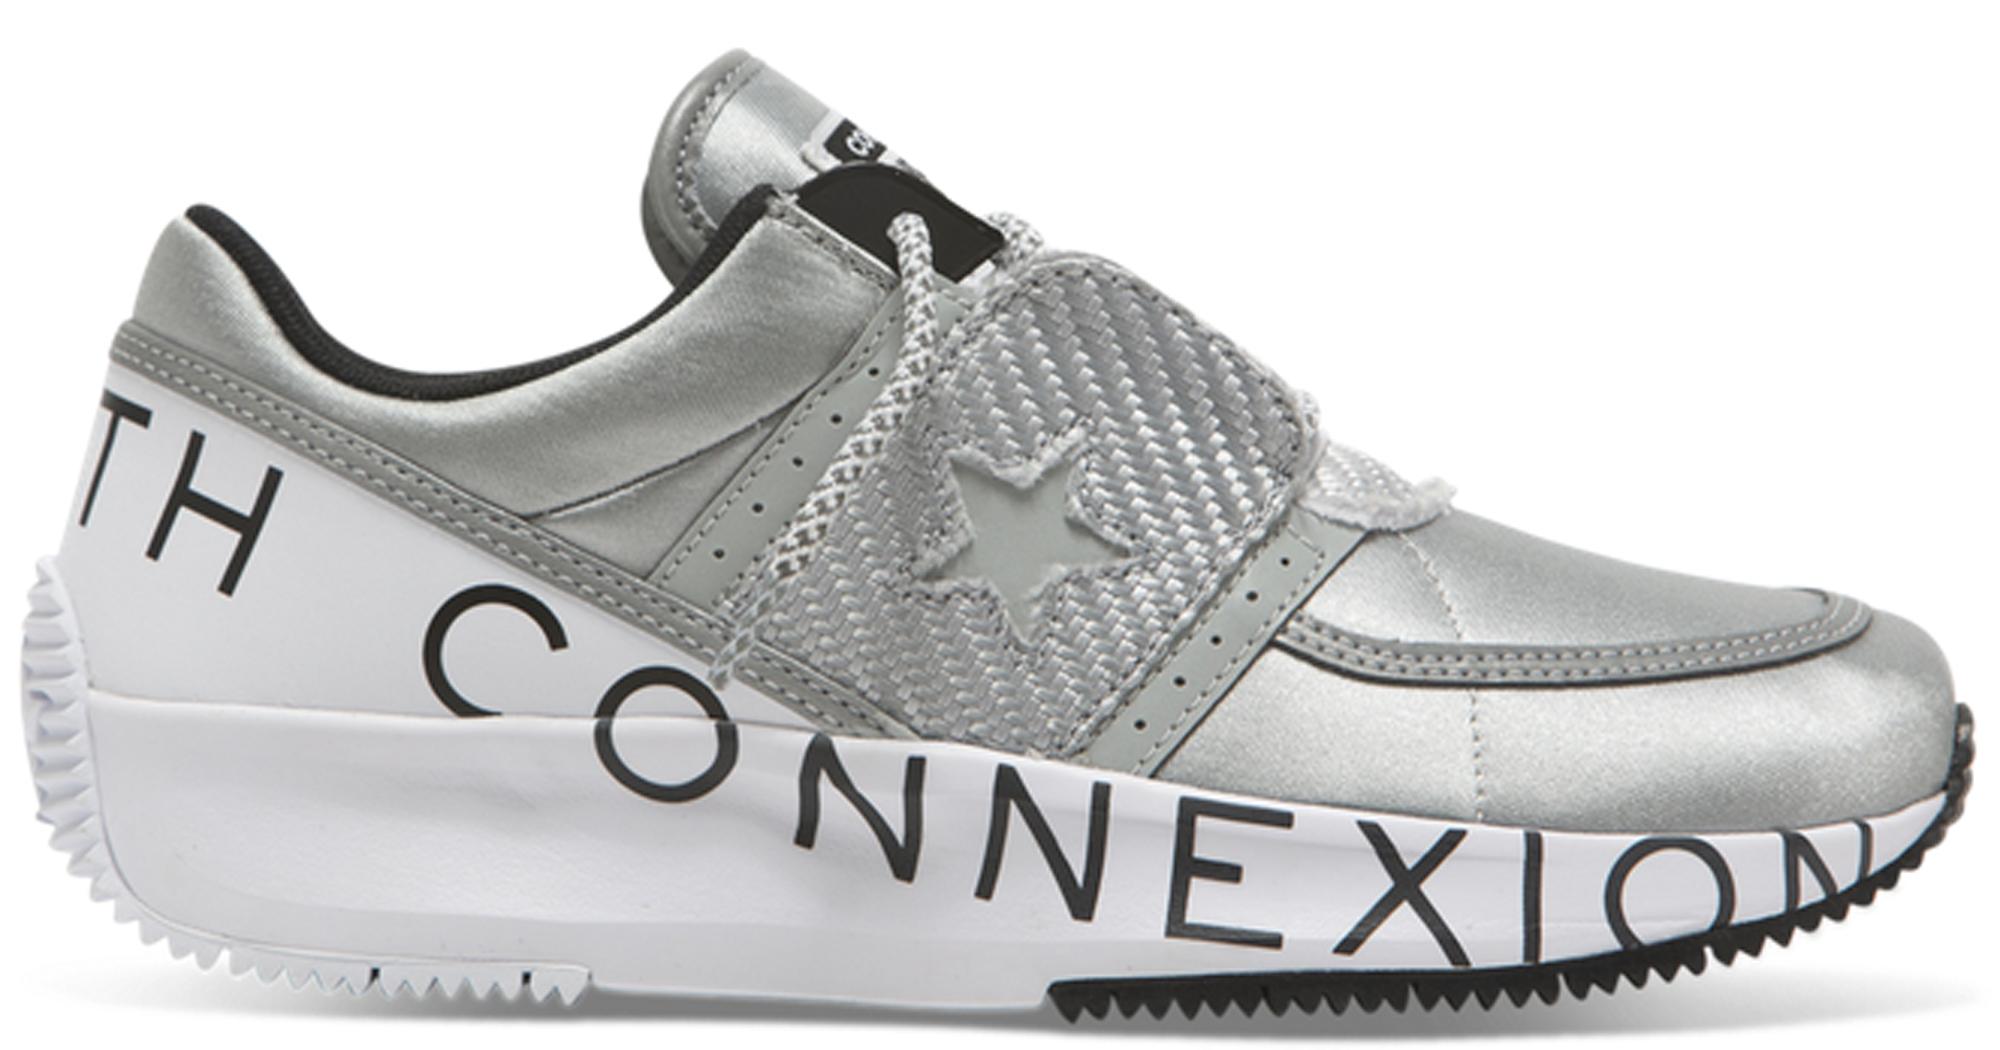 Converse Run Star Low Faith Connexion